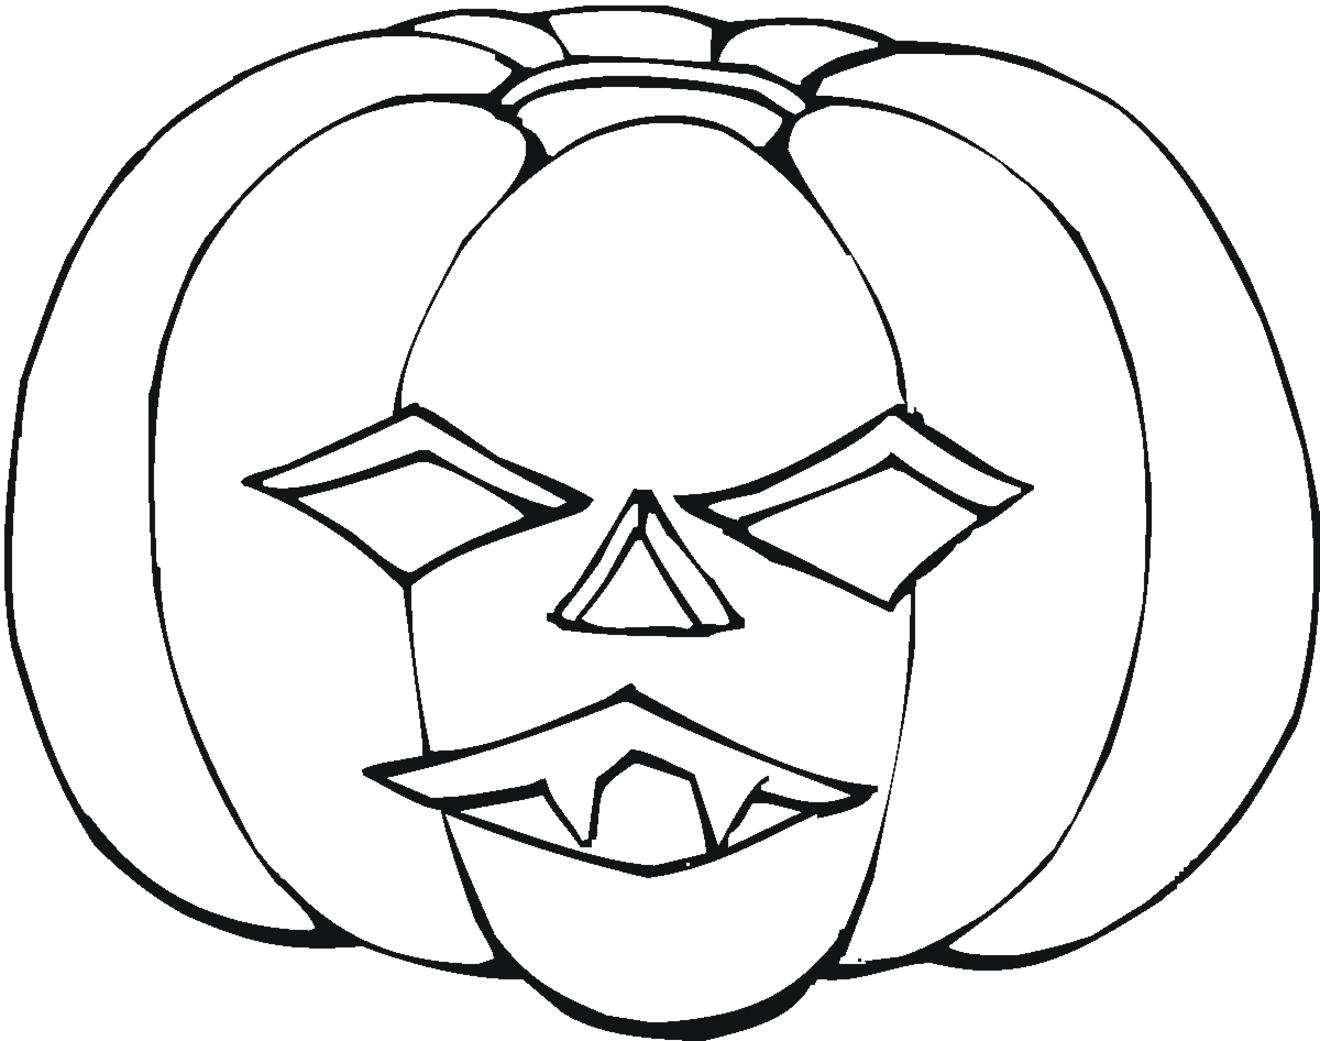 1320x1041 Pumpkin Coloring Pages Printable Beautiful Free Printable Pumpkin